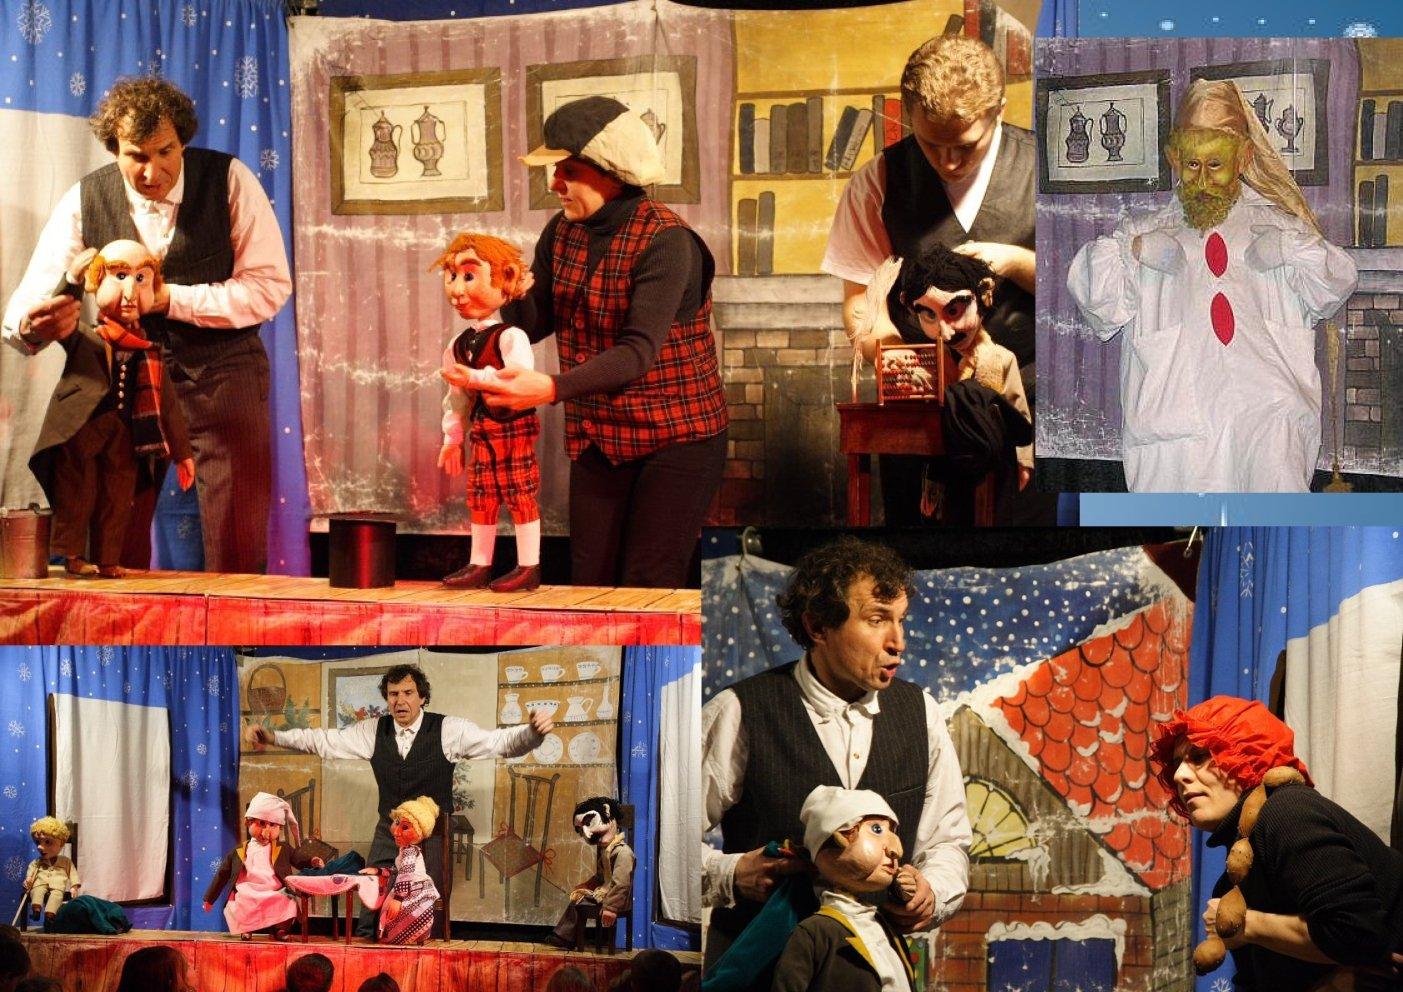 teatr-qfer-opowiesc-wigilijna